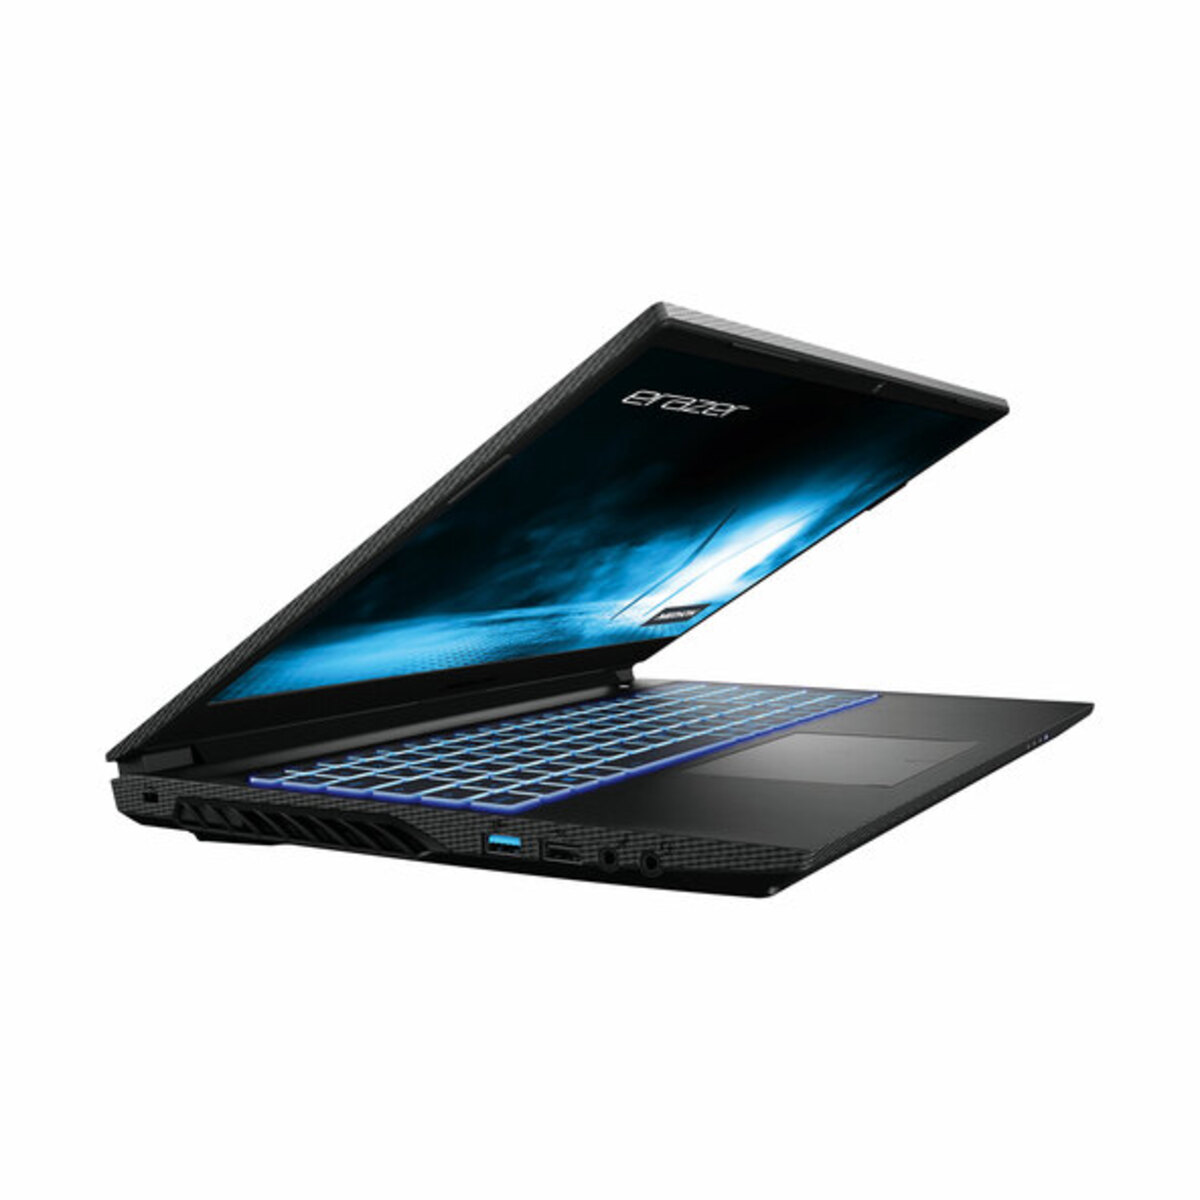 Bild 5 von Core-Gaming-Notebook Crawler E25 (MD63935)